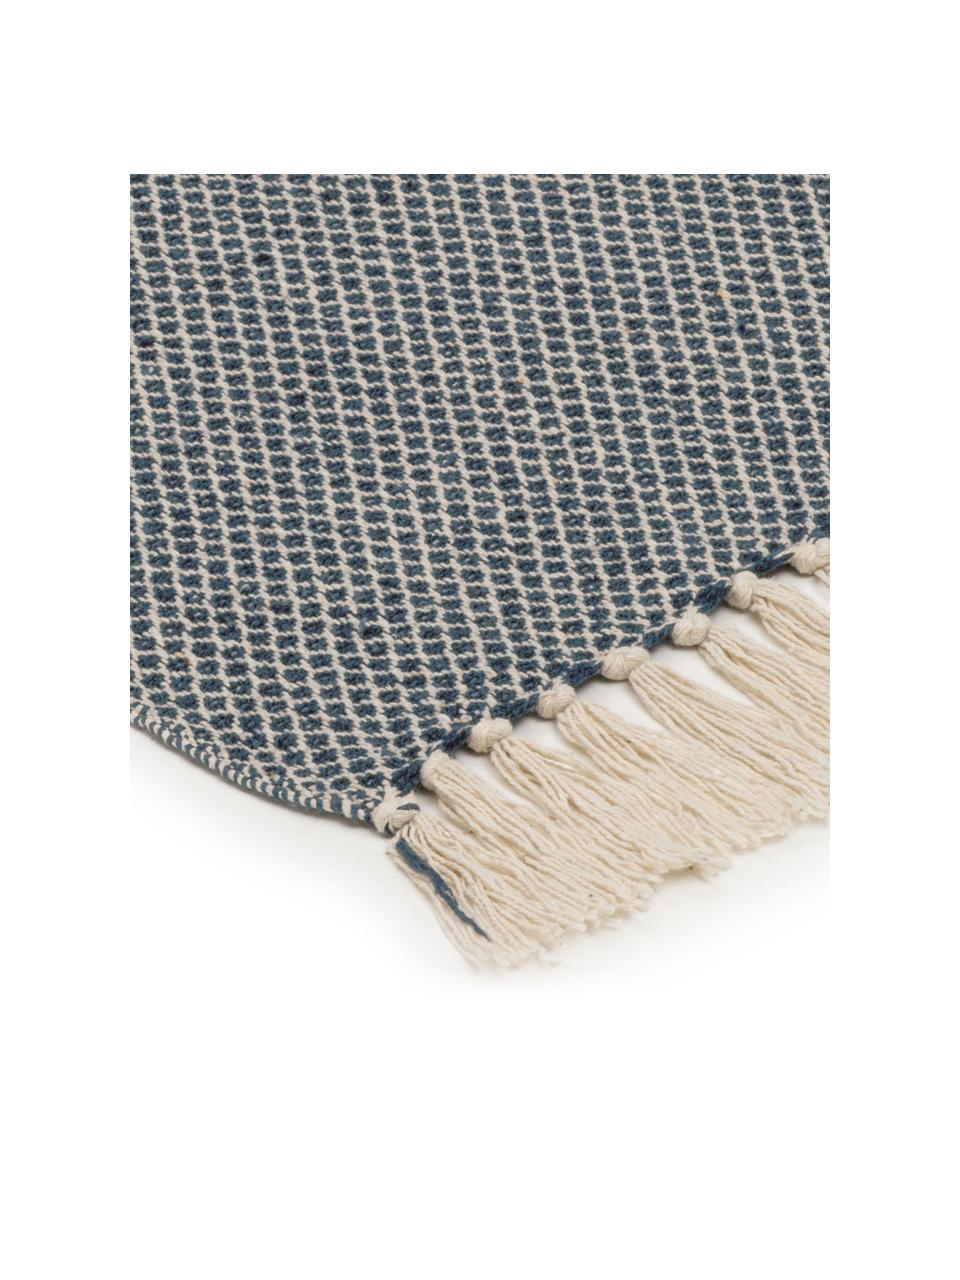 Fein gemustertes Plaid Thea mit Fransenabschluss, 58%Baumwolle,22%Polyester, 12%Acryl,4%Rayon,4%Nylon, Dunkles Marineblau, Hellbeige, 140 x 170 cm